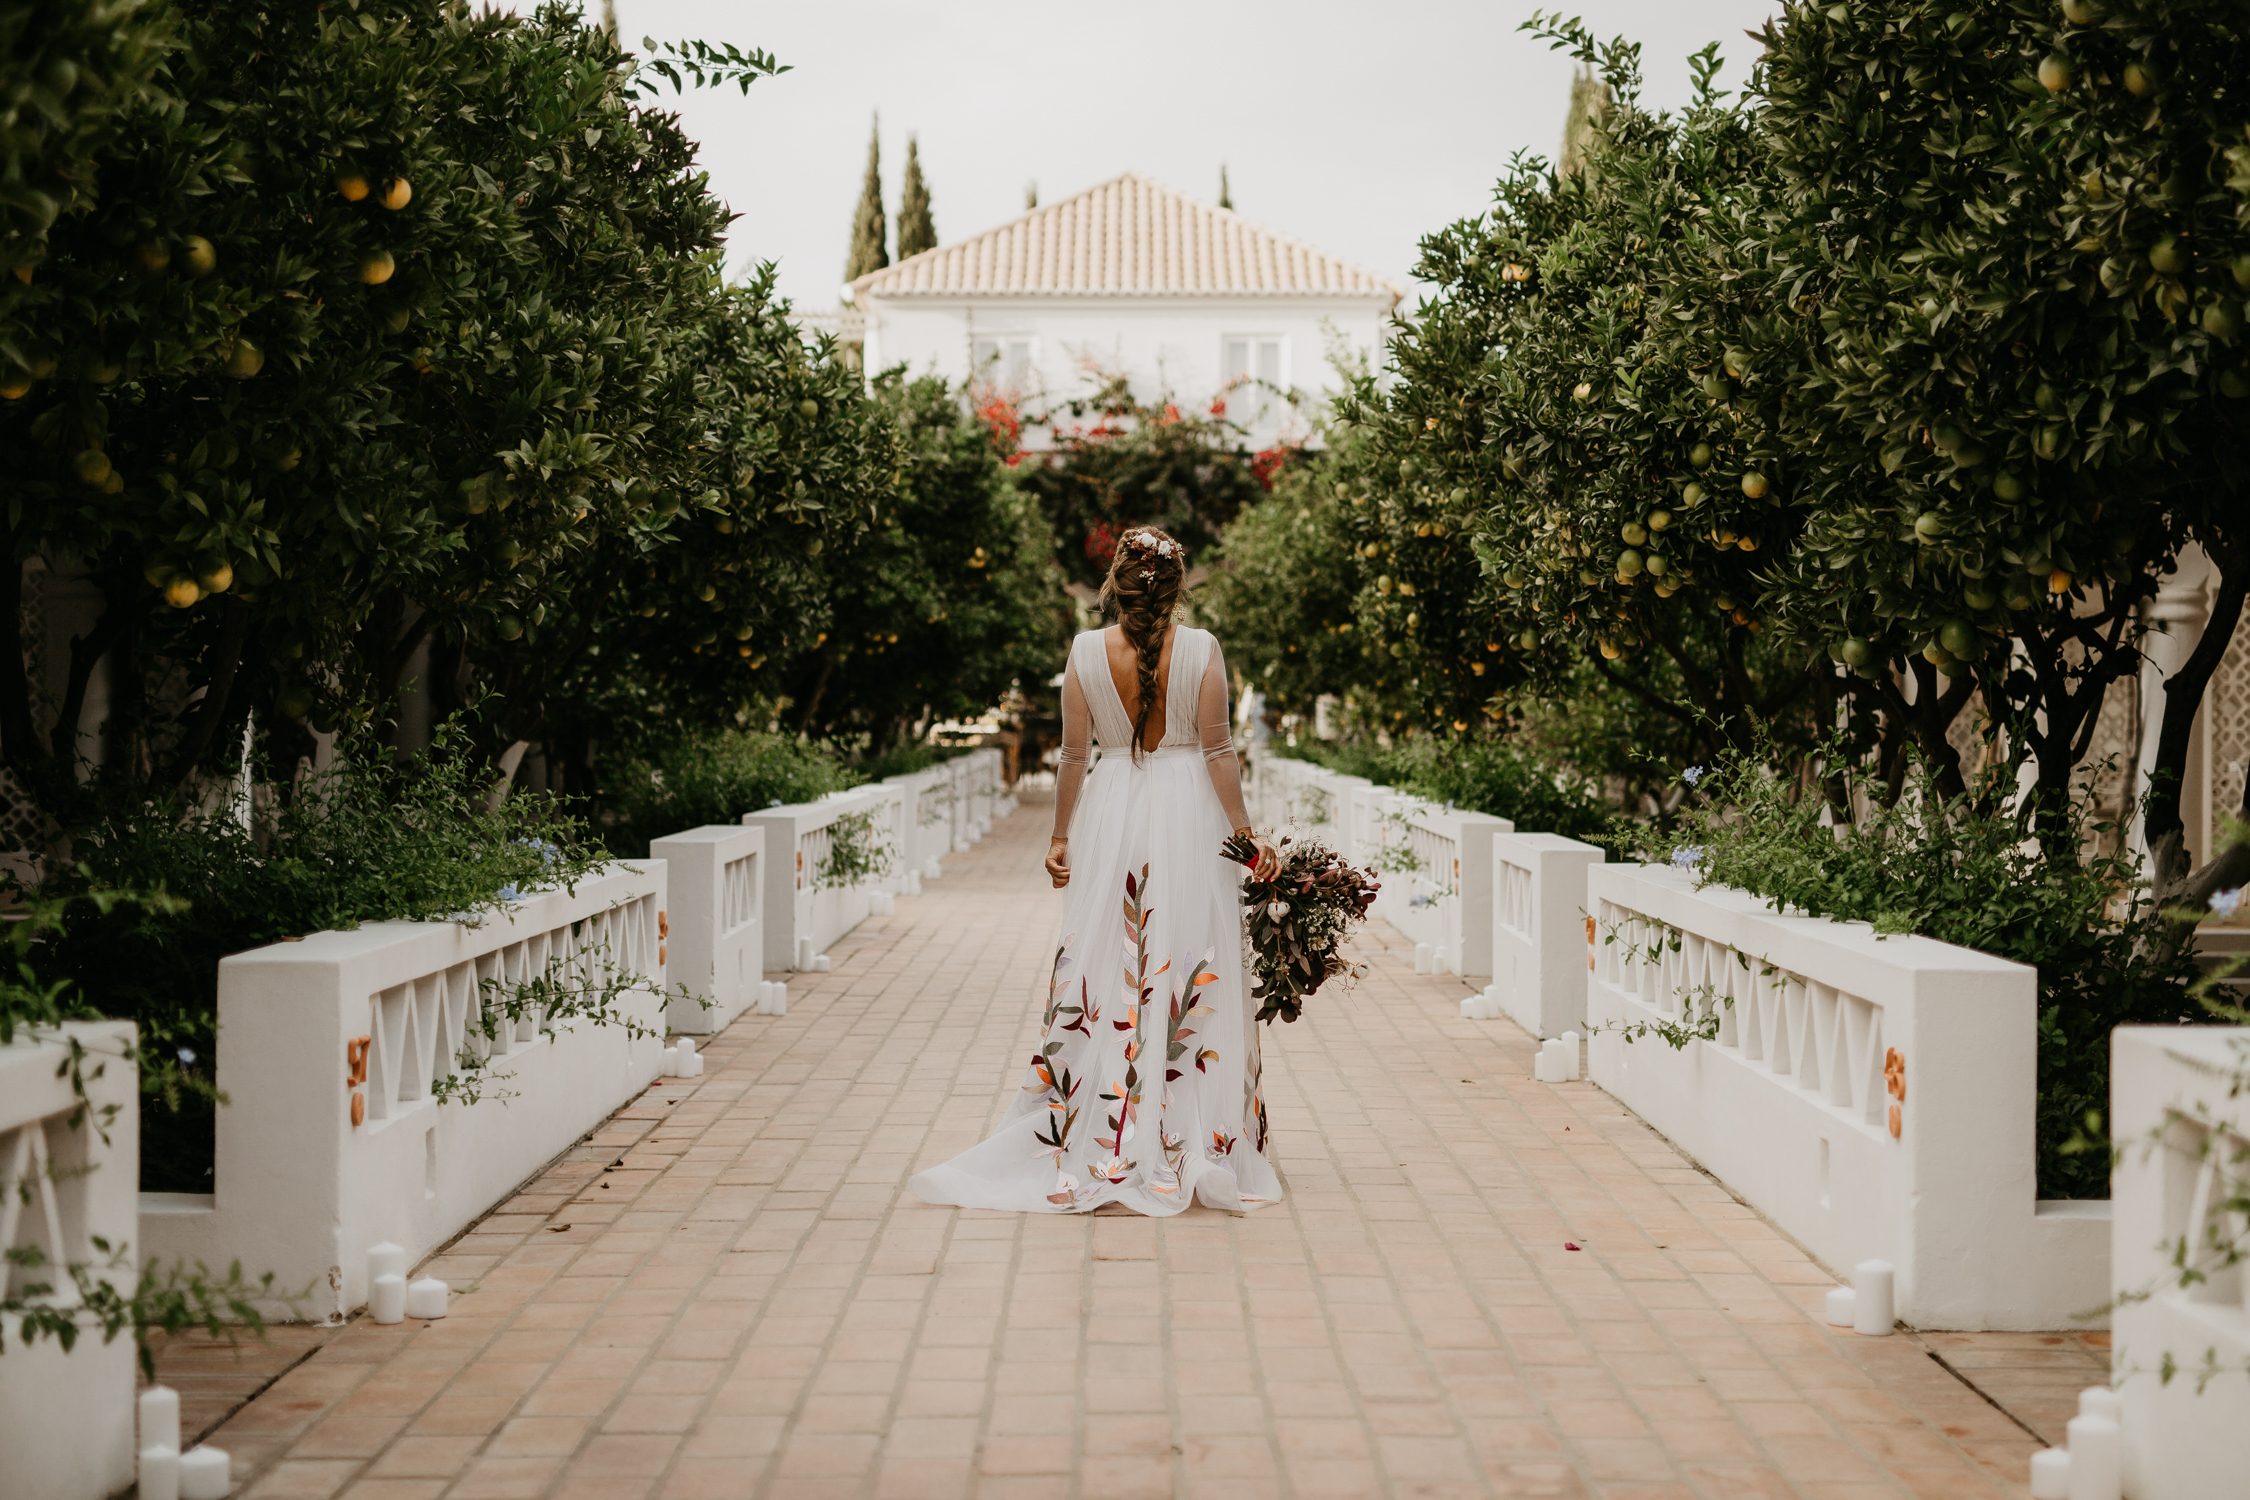 Vila Monte destination wedding the framers